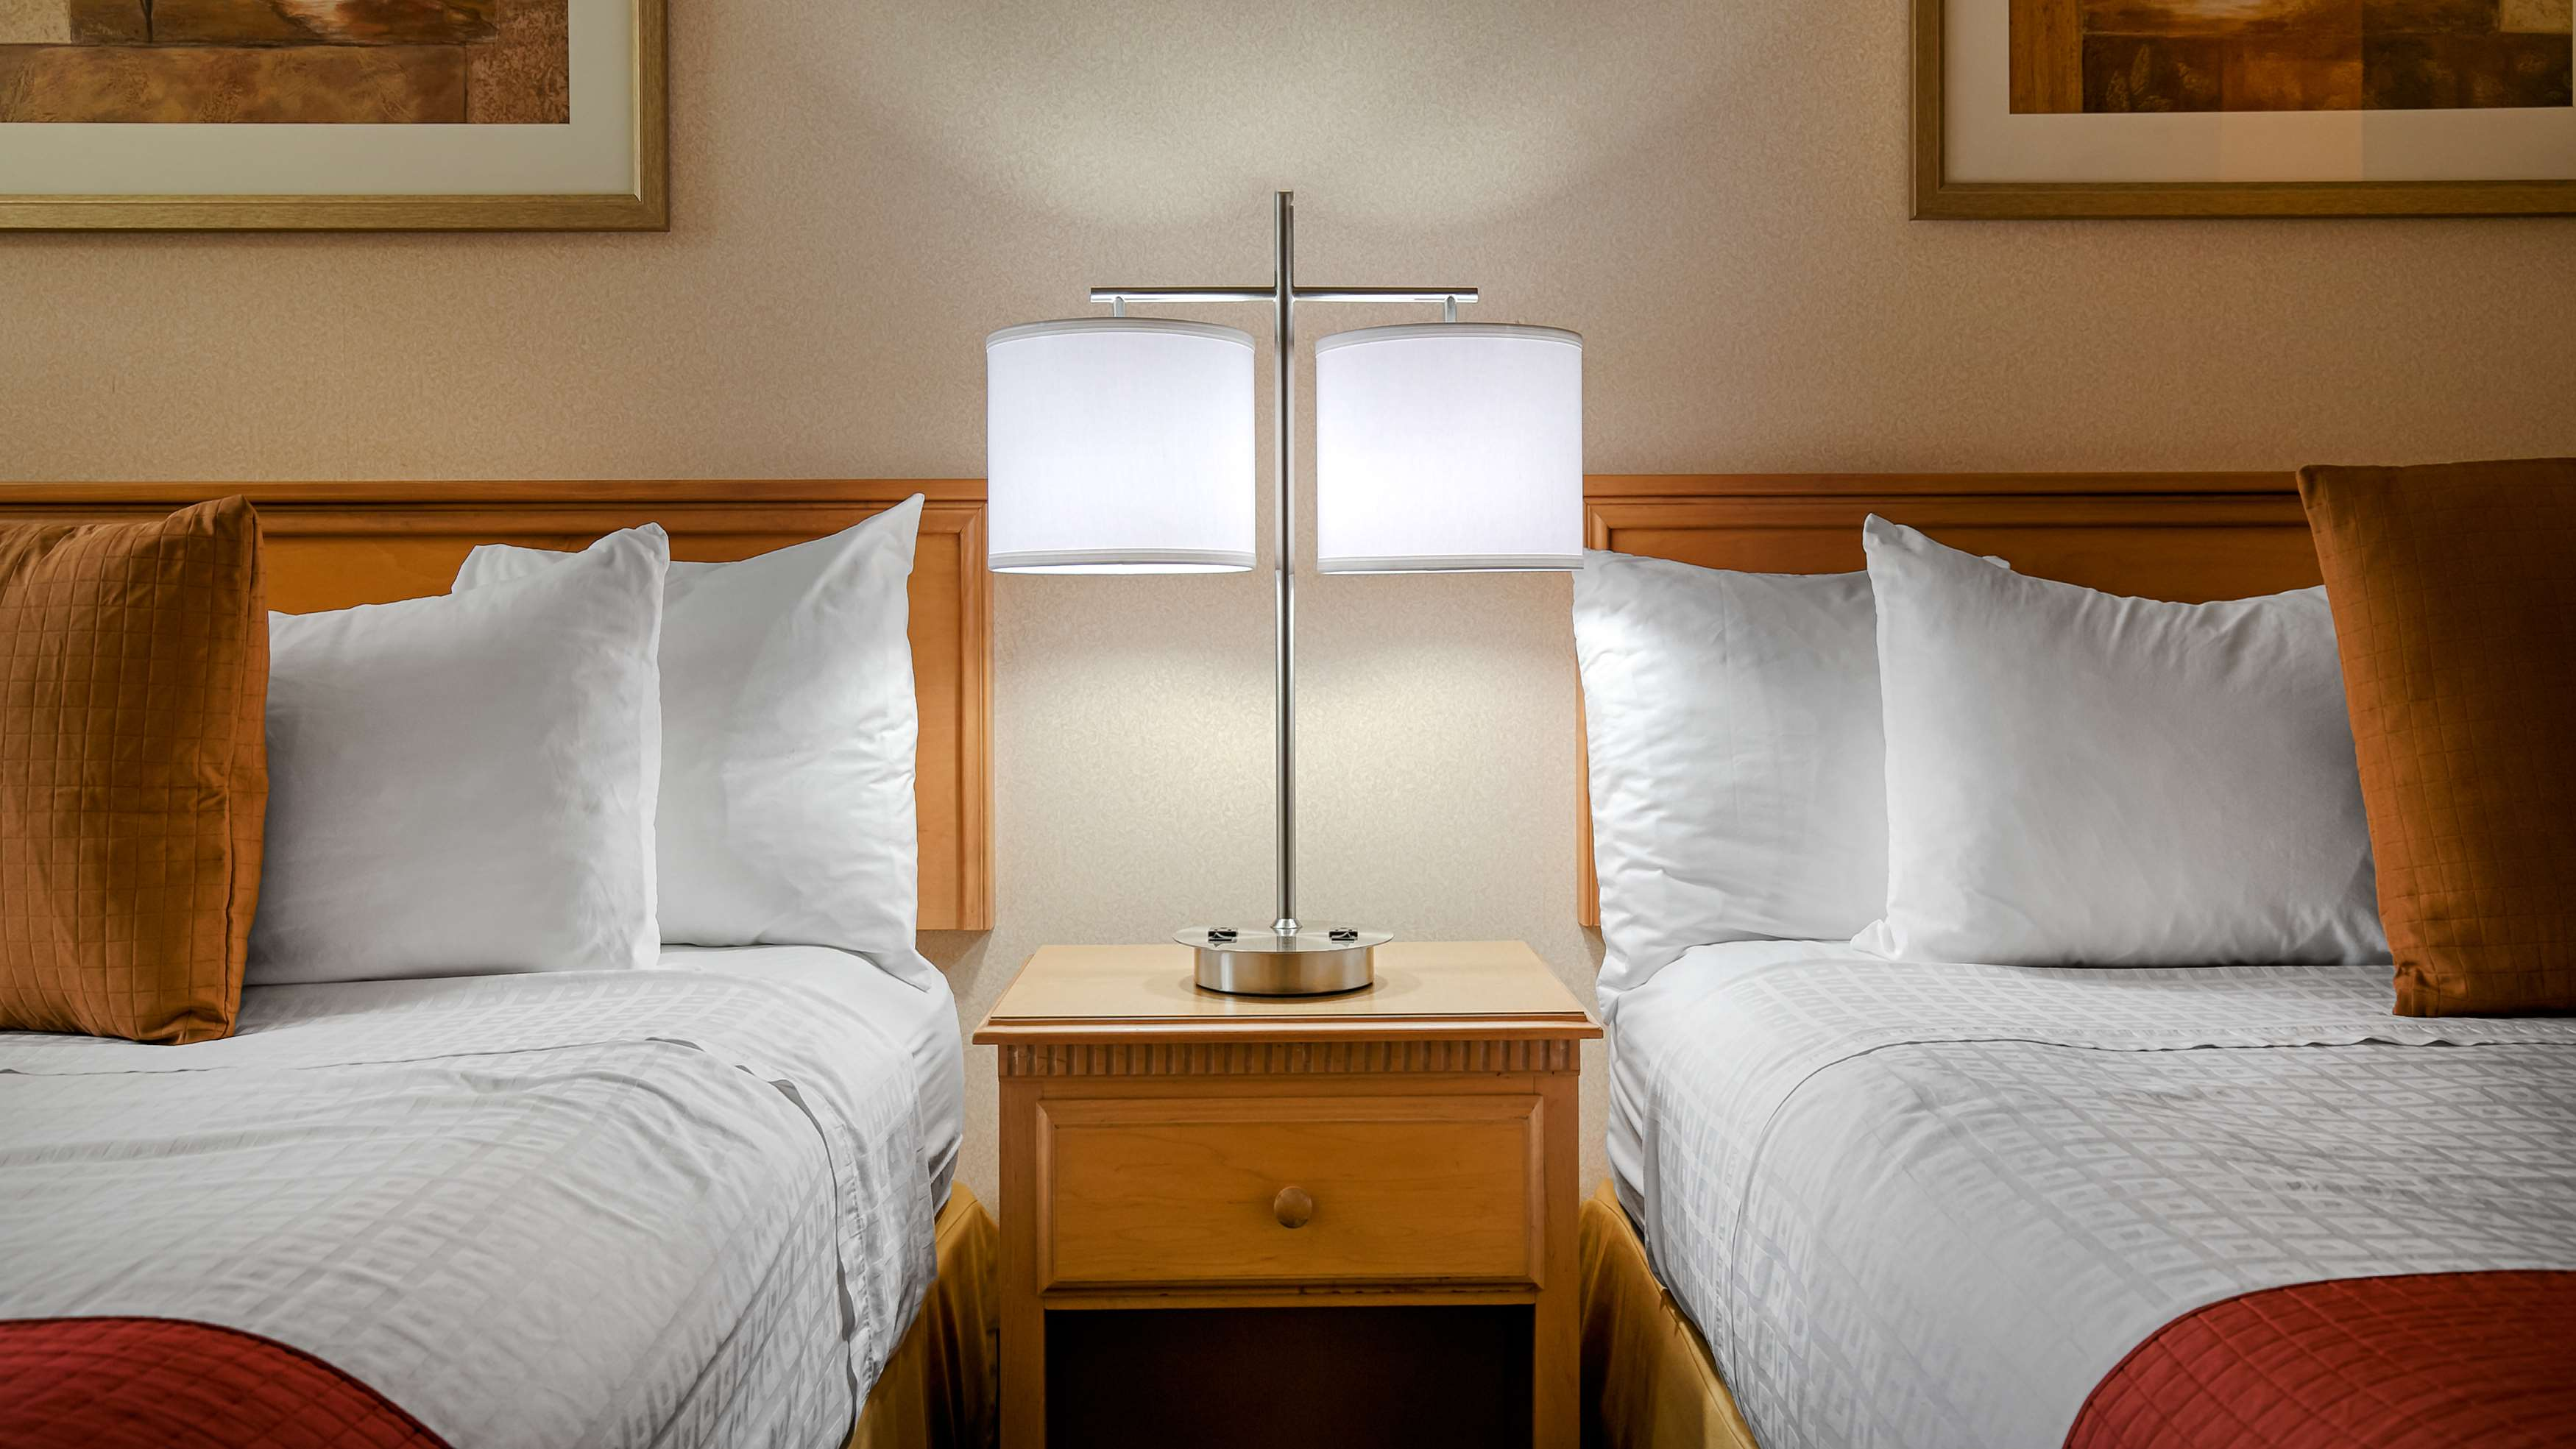 Best Western Horizon Inn image 27